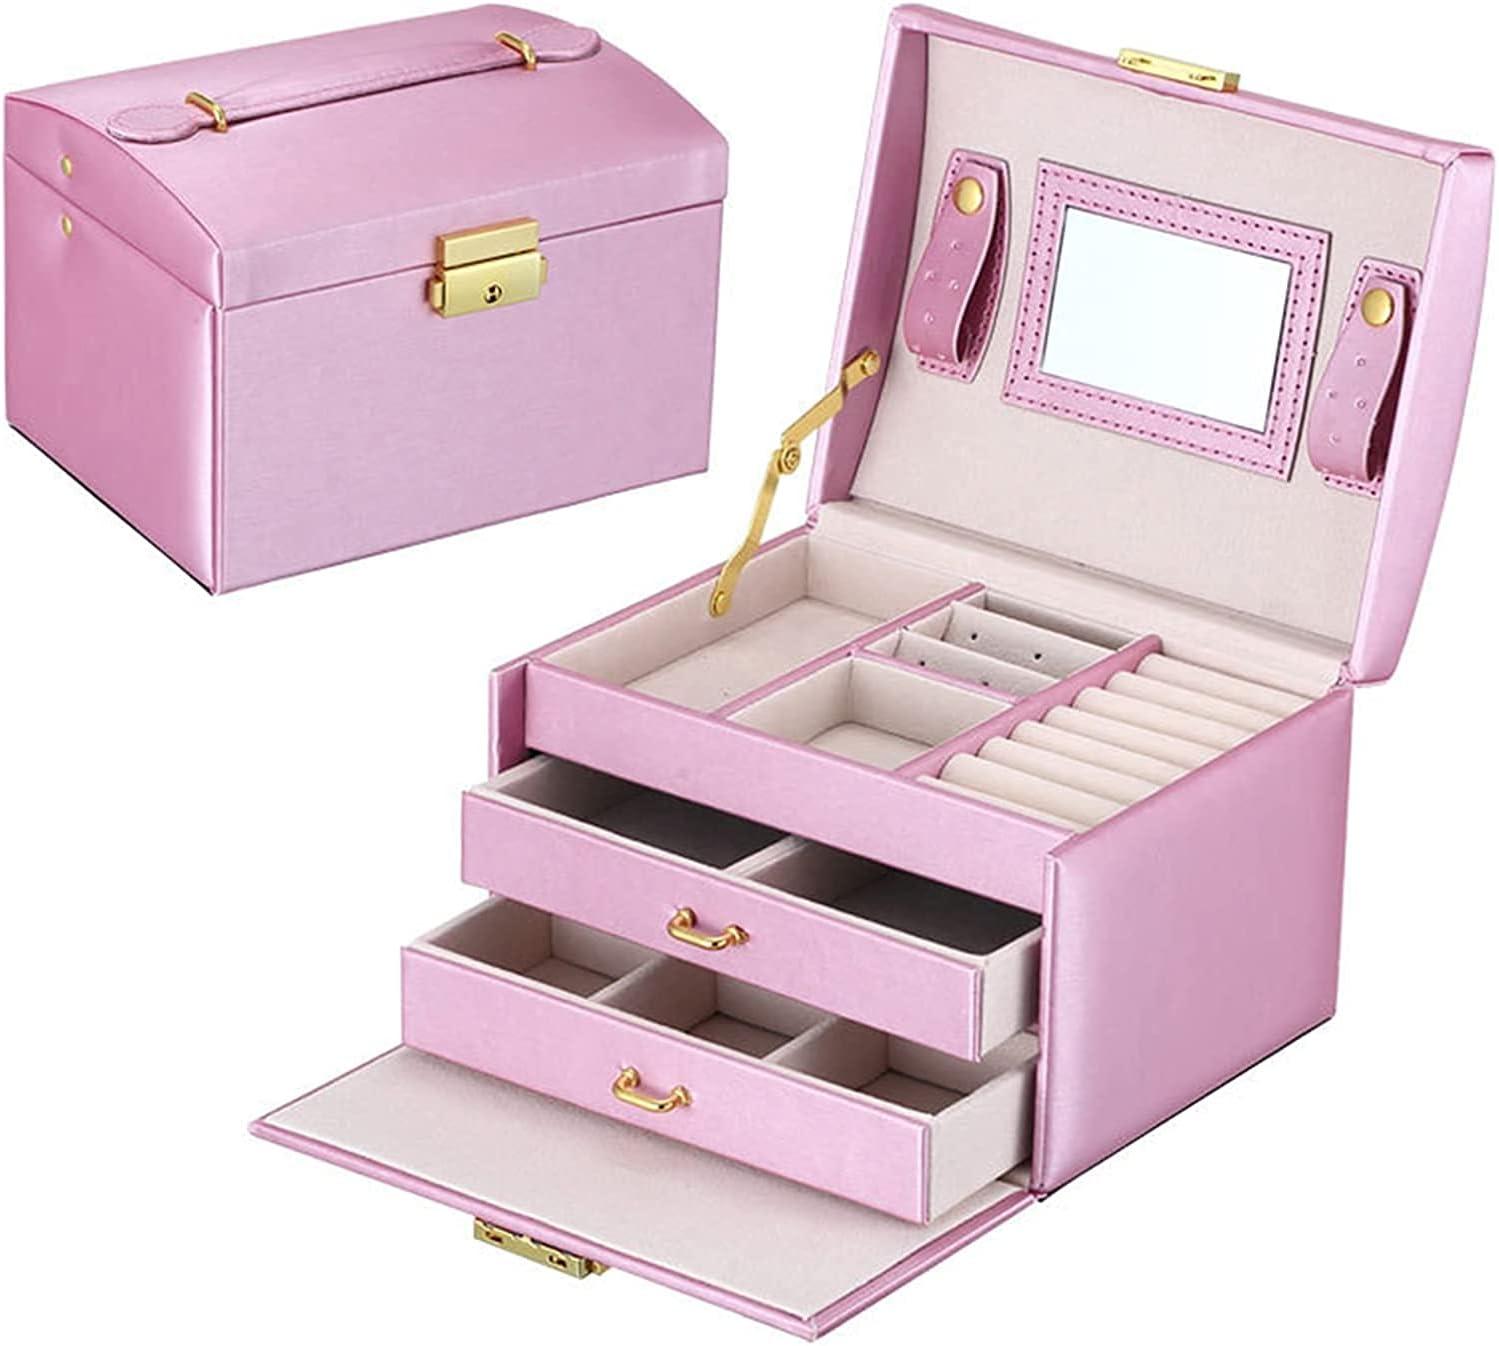 Ghlevo PU Attention brand Jewelry Box Organizer Storage Ca Time sale